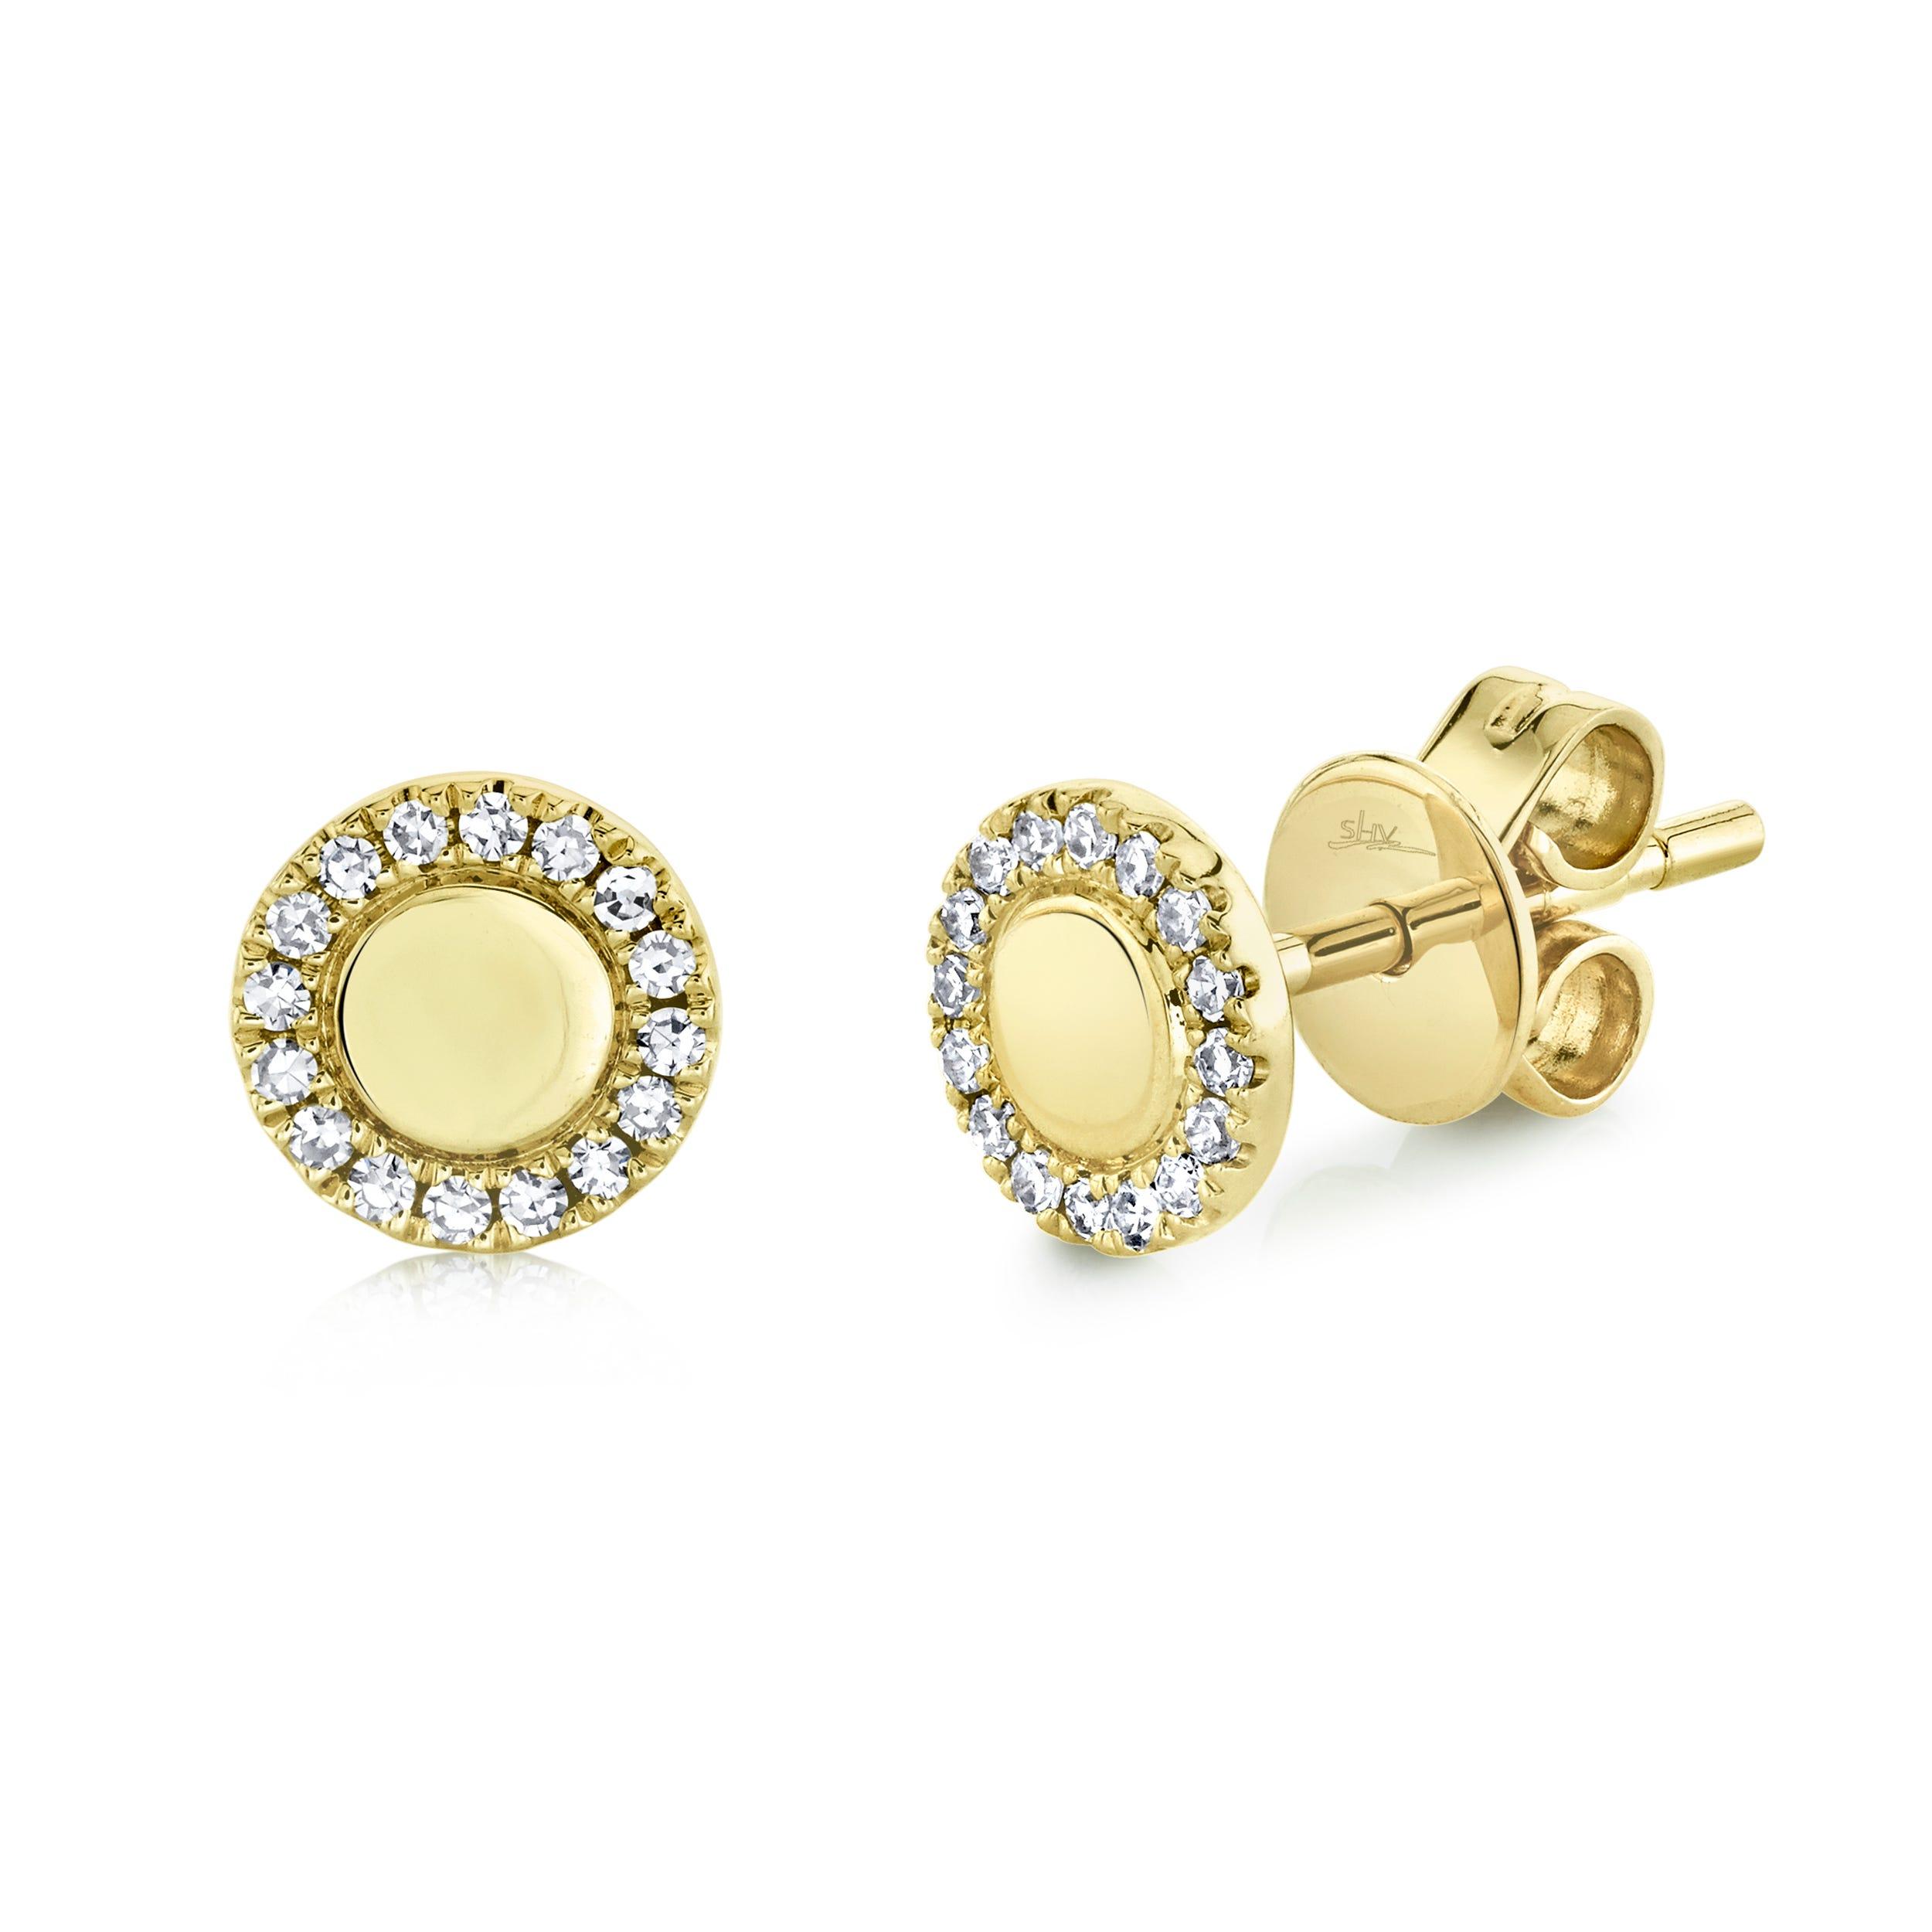 Shy Creation 0.10ctw. Diamond Circle Stud Earrings in 14k Yellow Gold SC55019457